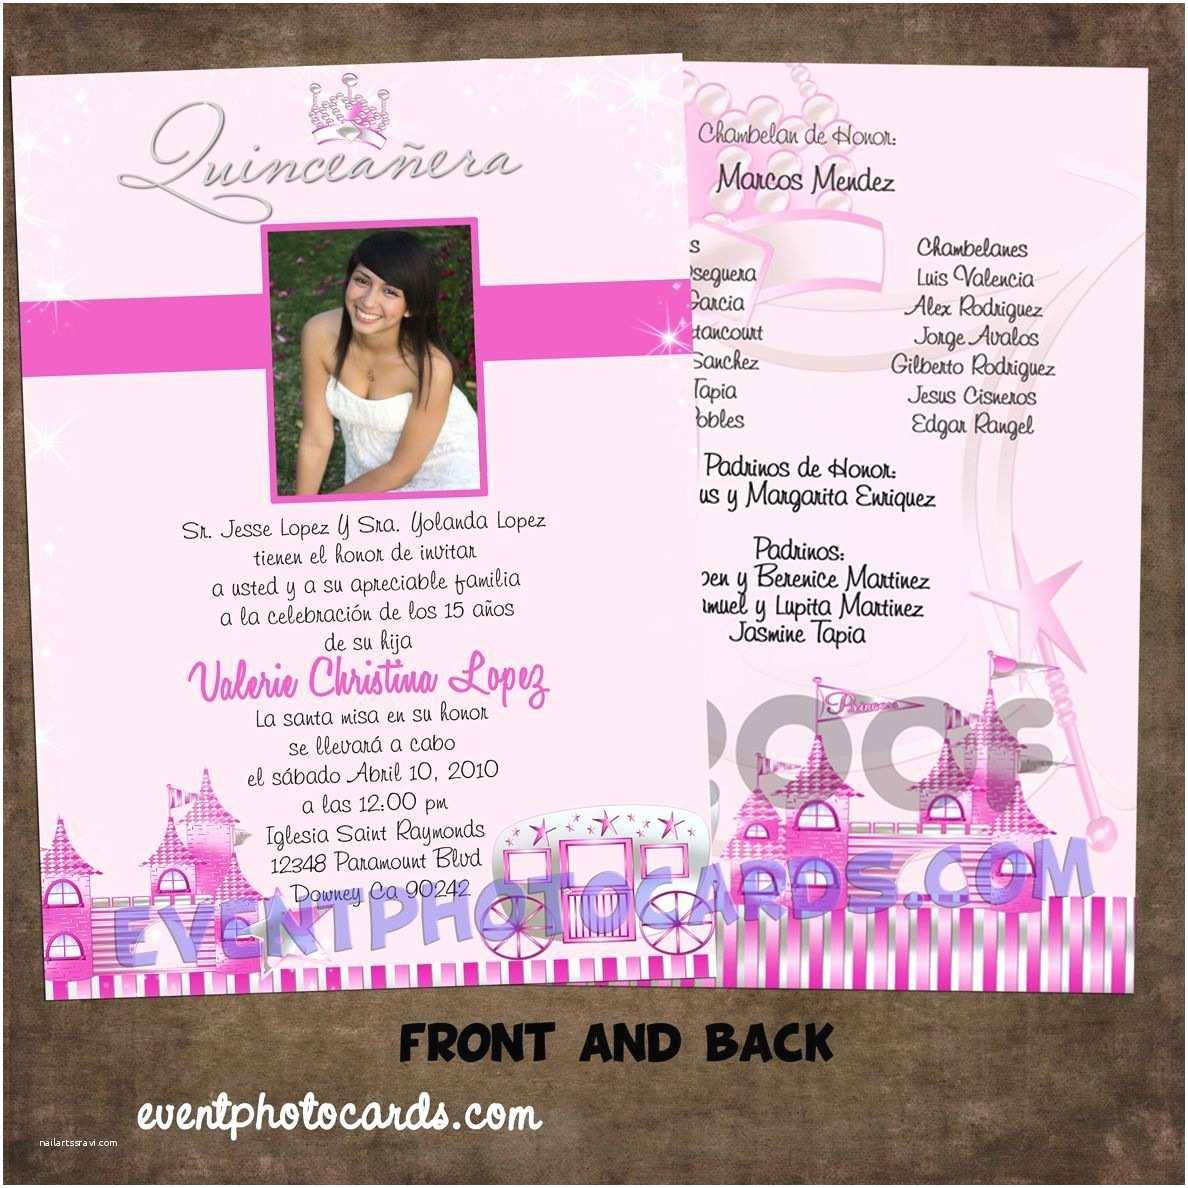 Quinceanera Invitation Wording Princess Beautiful Quinceanera Sweet 16 Invitations